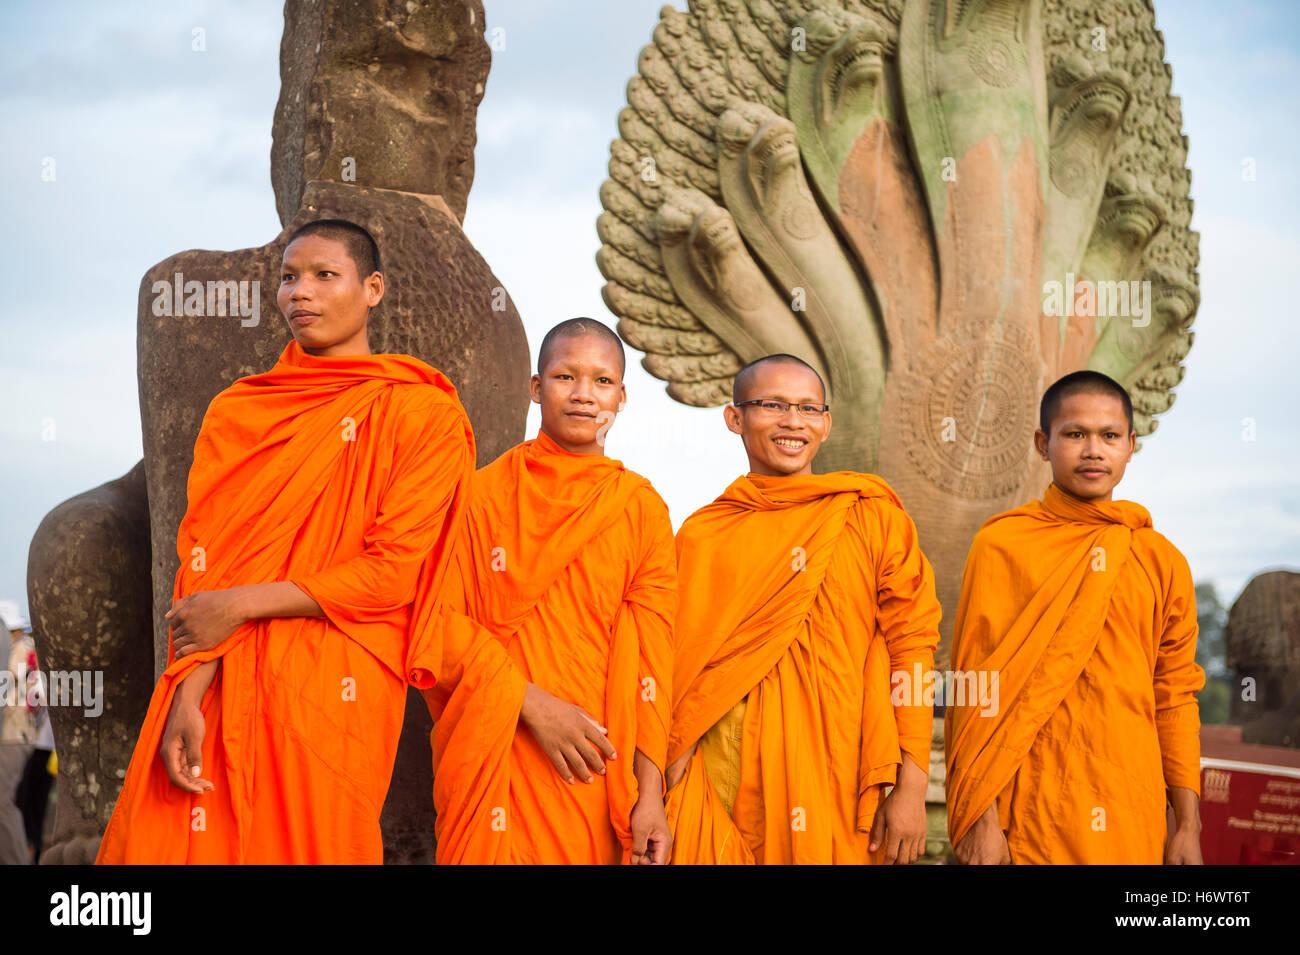 SIEM REAP, Cambodge - 30 octobre 2014: Novice moines bouddhistes en robe orange posent devant l'entrée Photo Stock